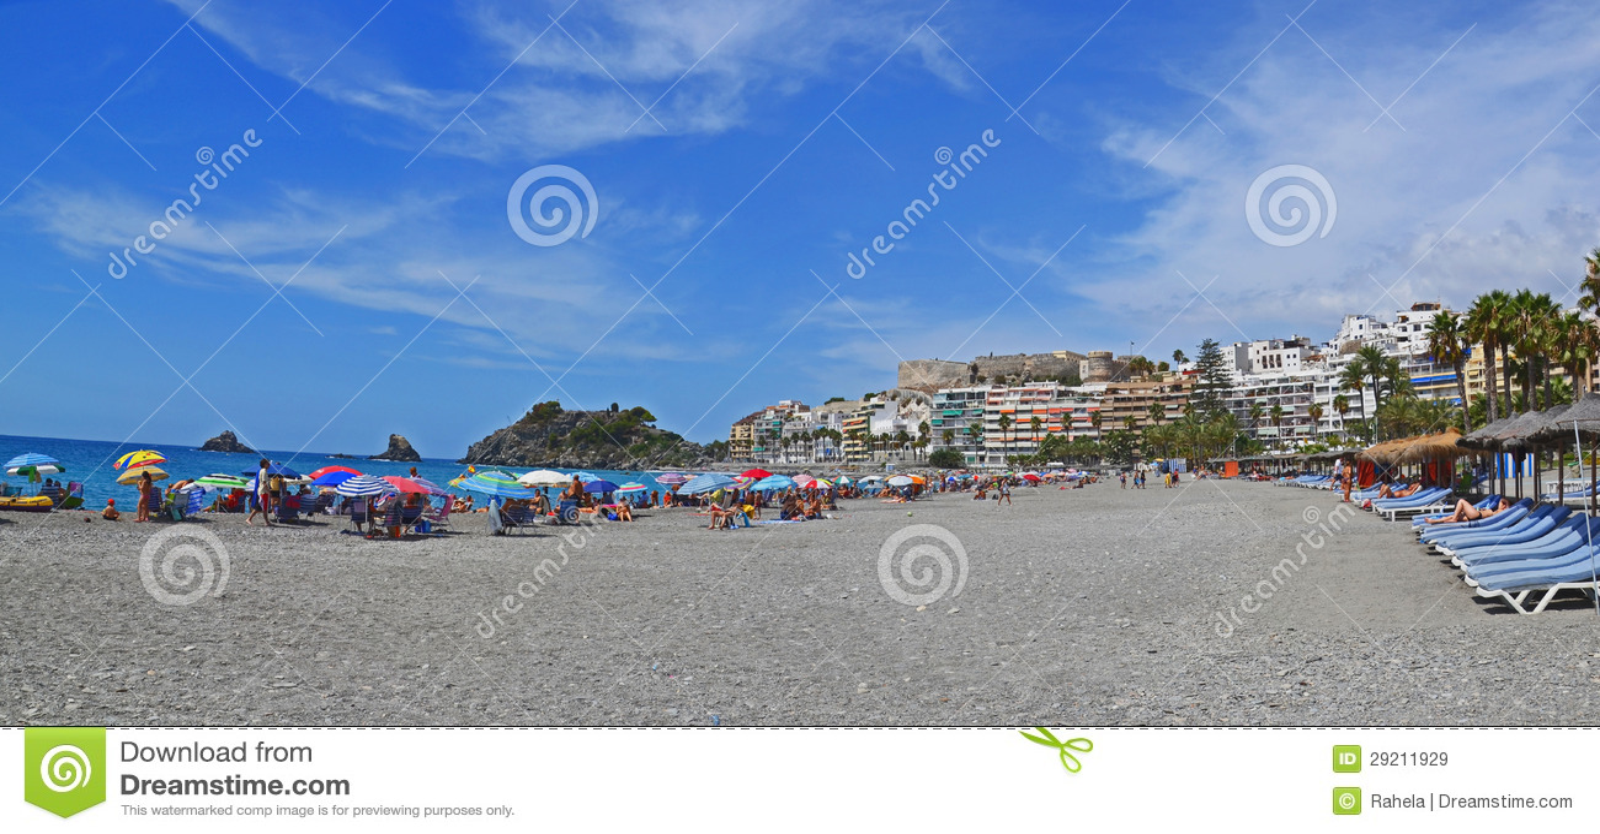 Station touristique Almunecar de bord de la mer en Espagne, panorama